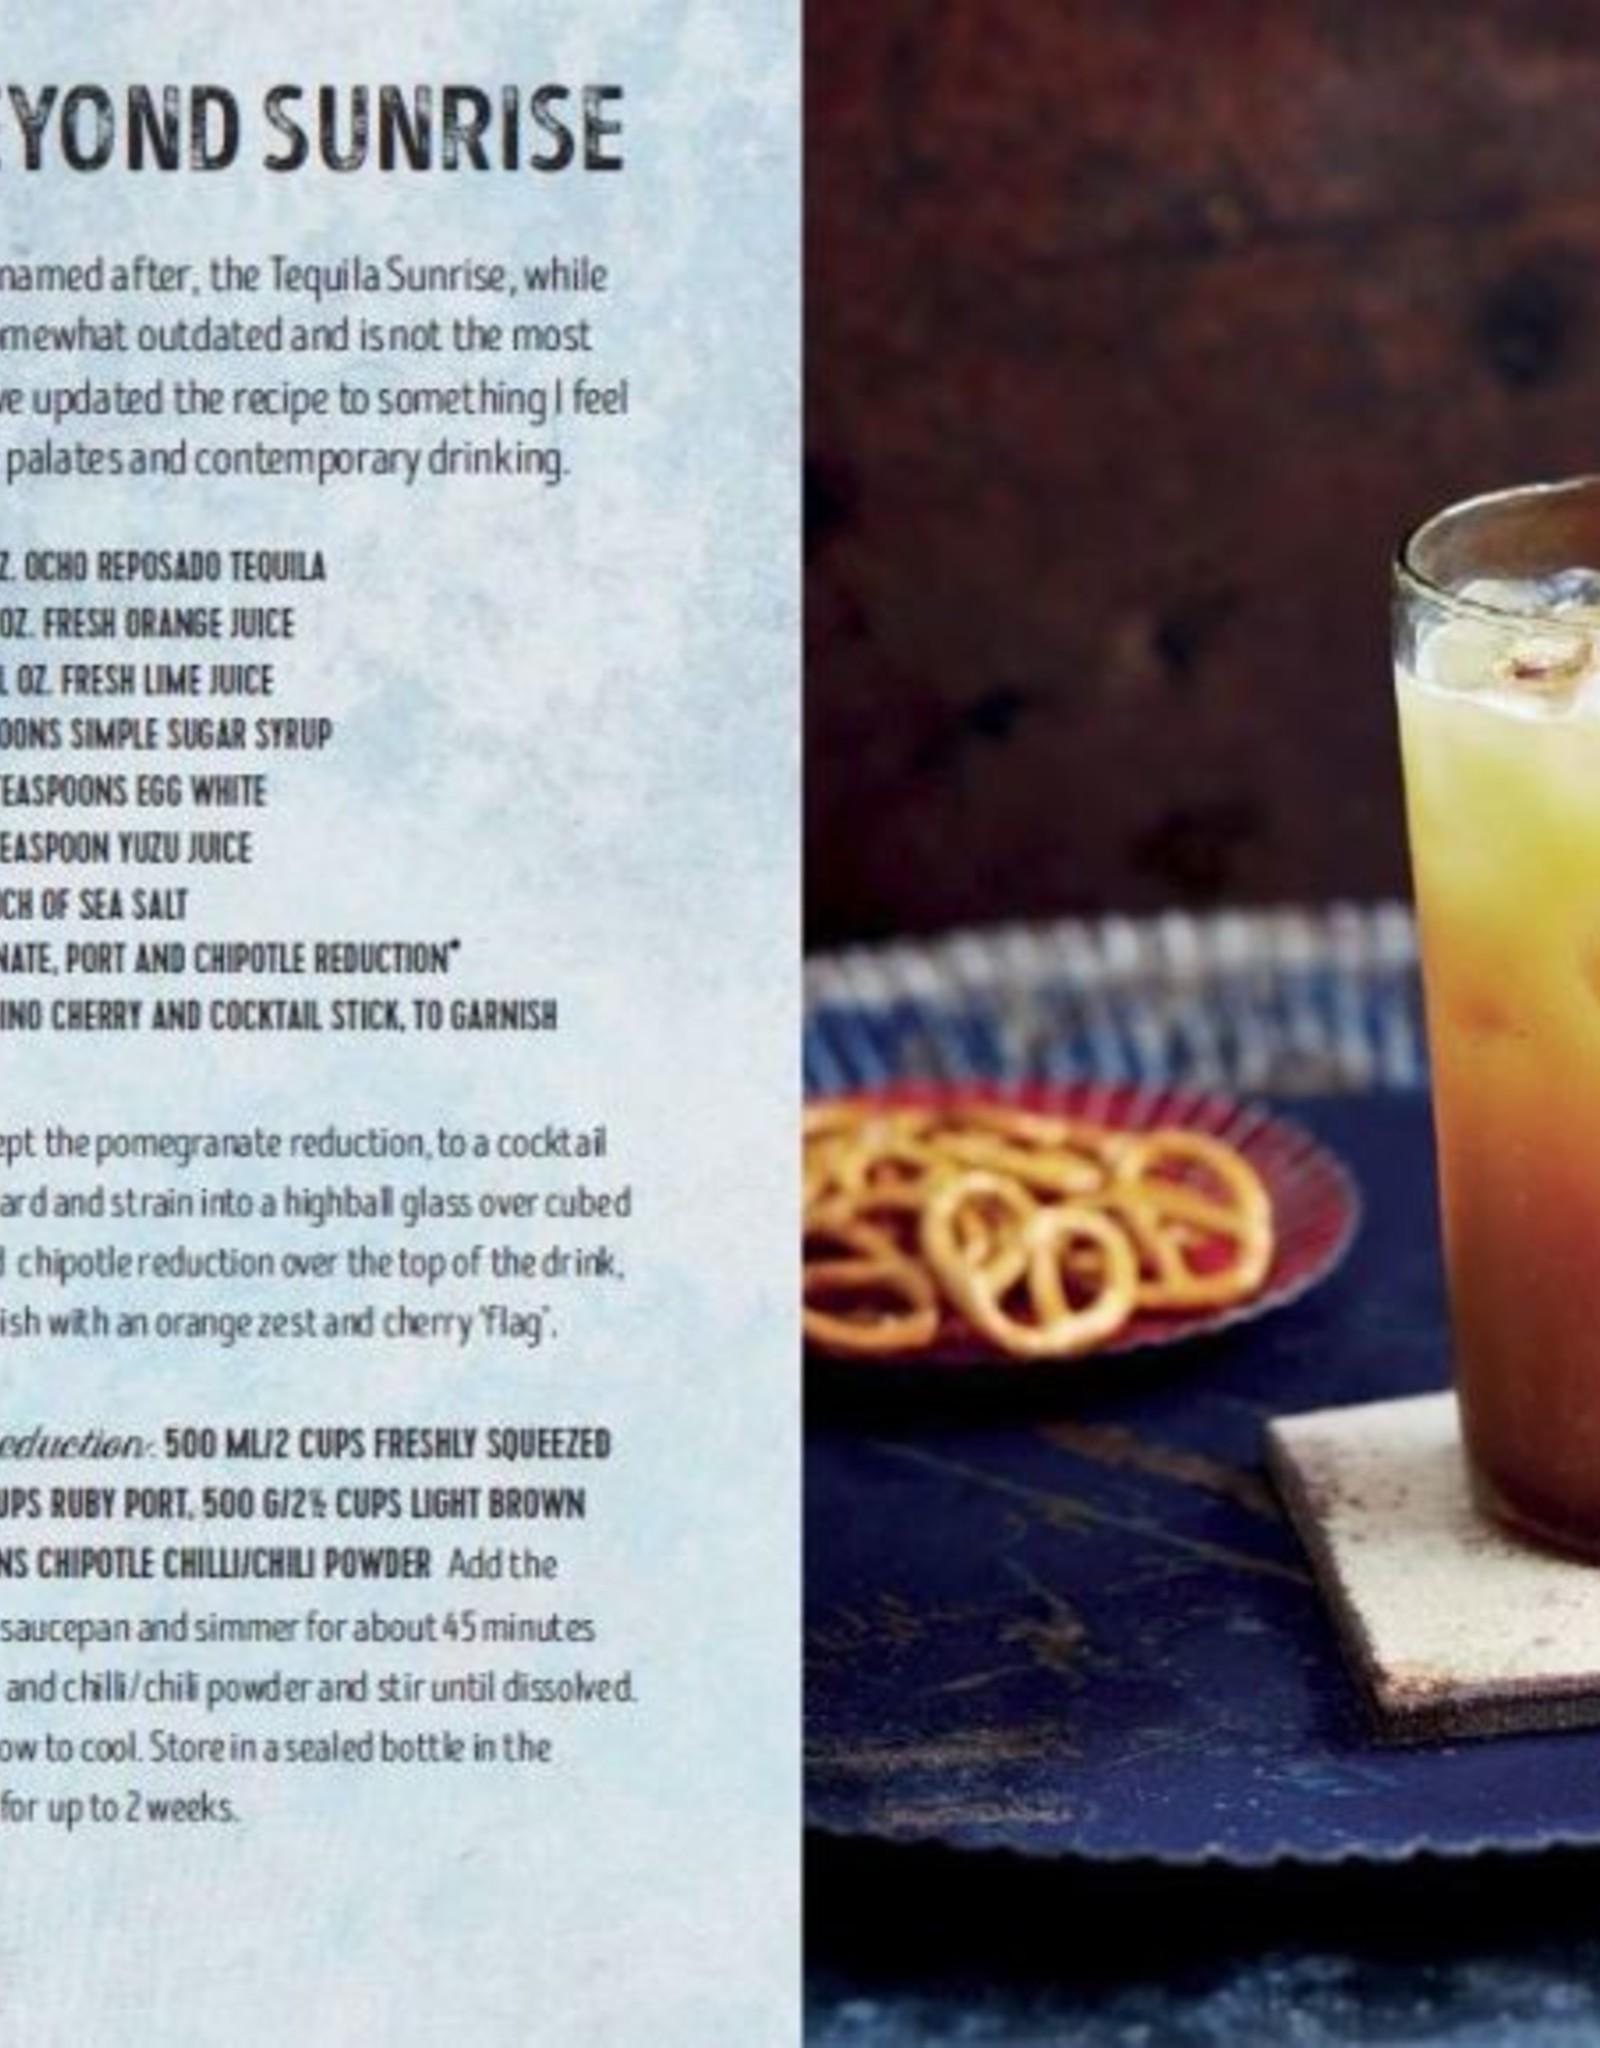 Simon & Schuster Tequila Beyond Sunrise